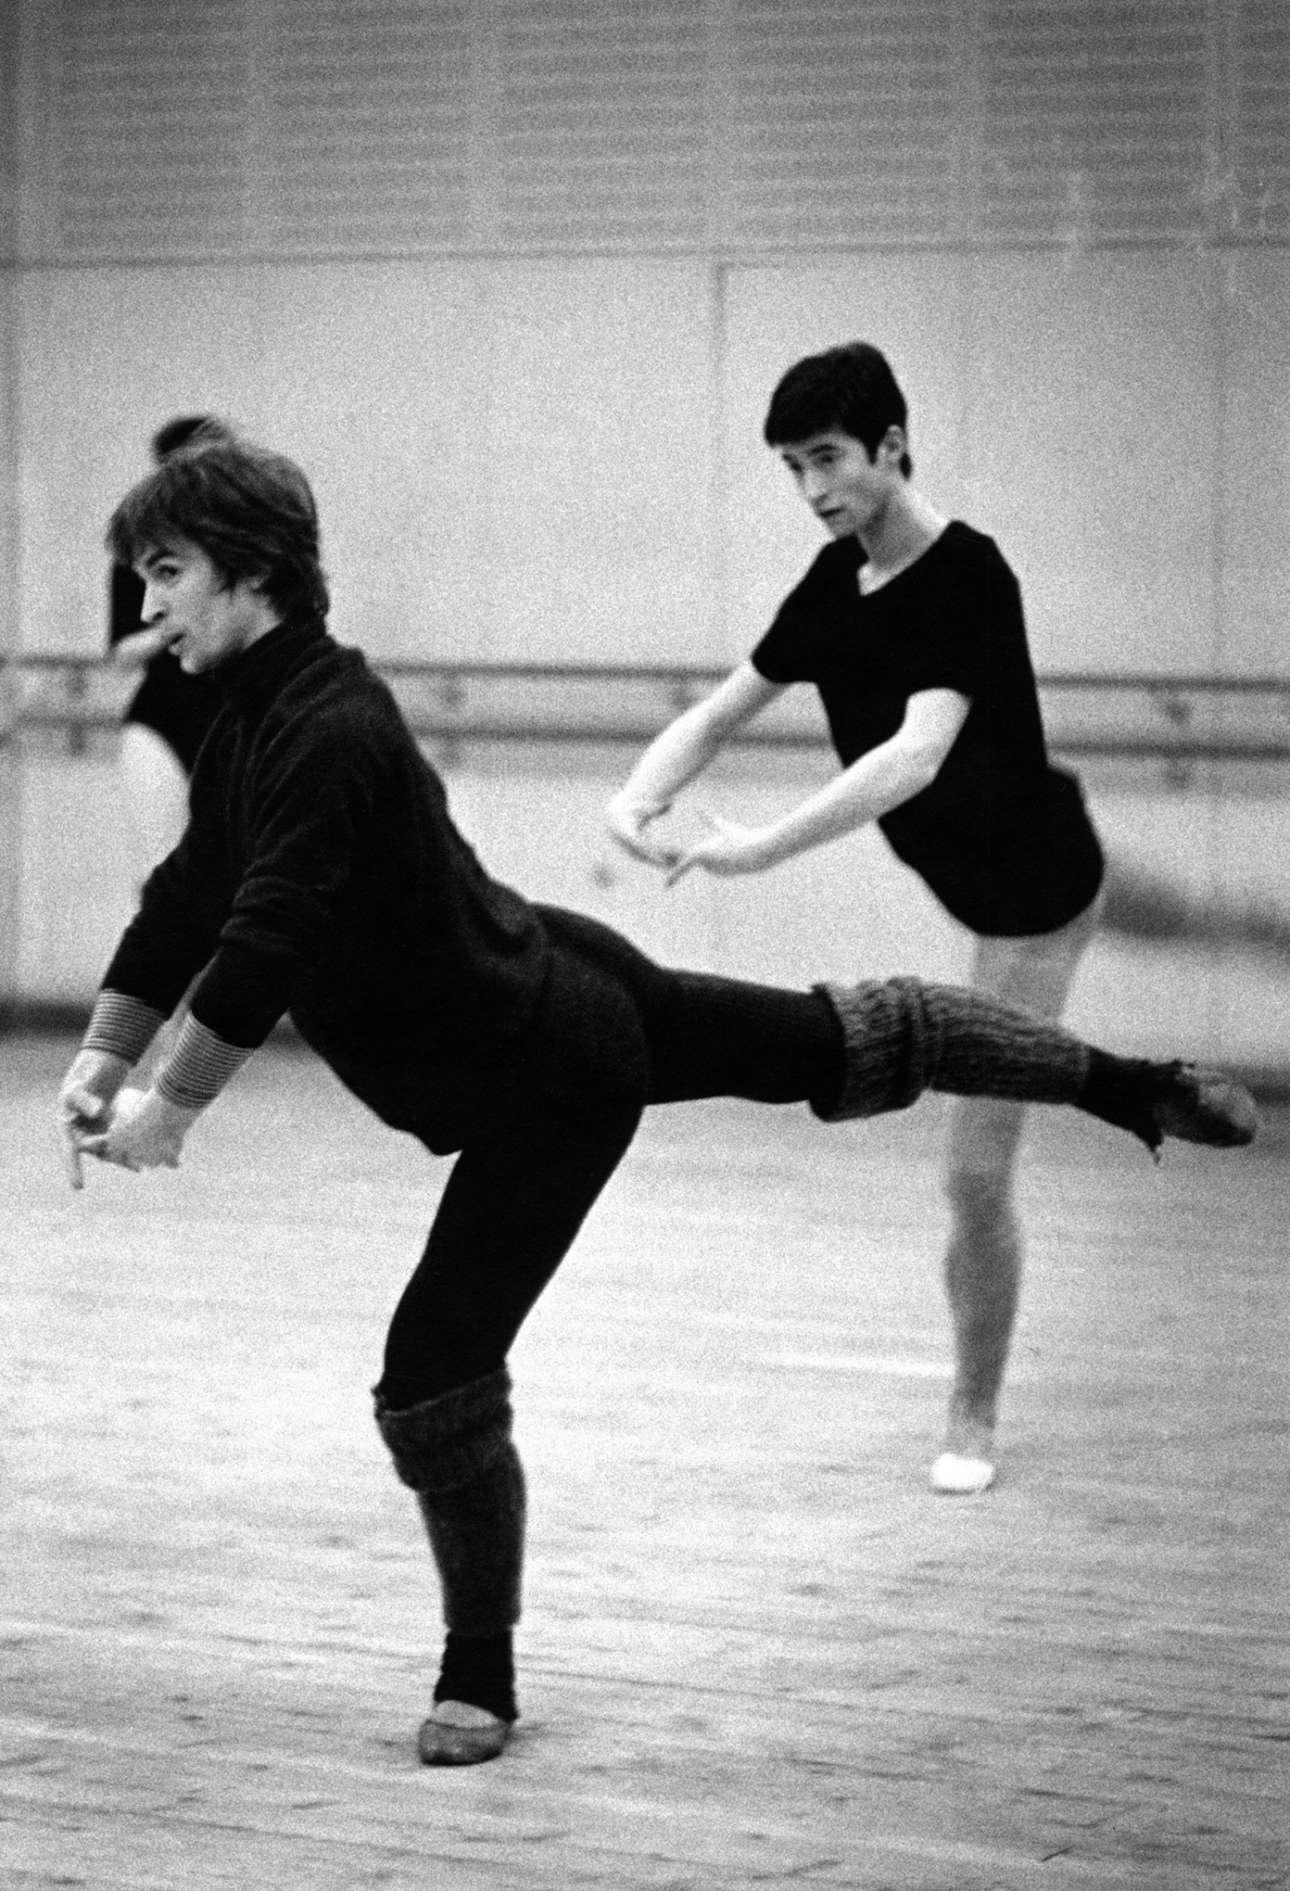 1966: o Ρούντολφ Νουρέγιεφ κάνει πρόβες για την παράσταση «Tancredi» στην Οπερα της Βιέννης